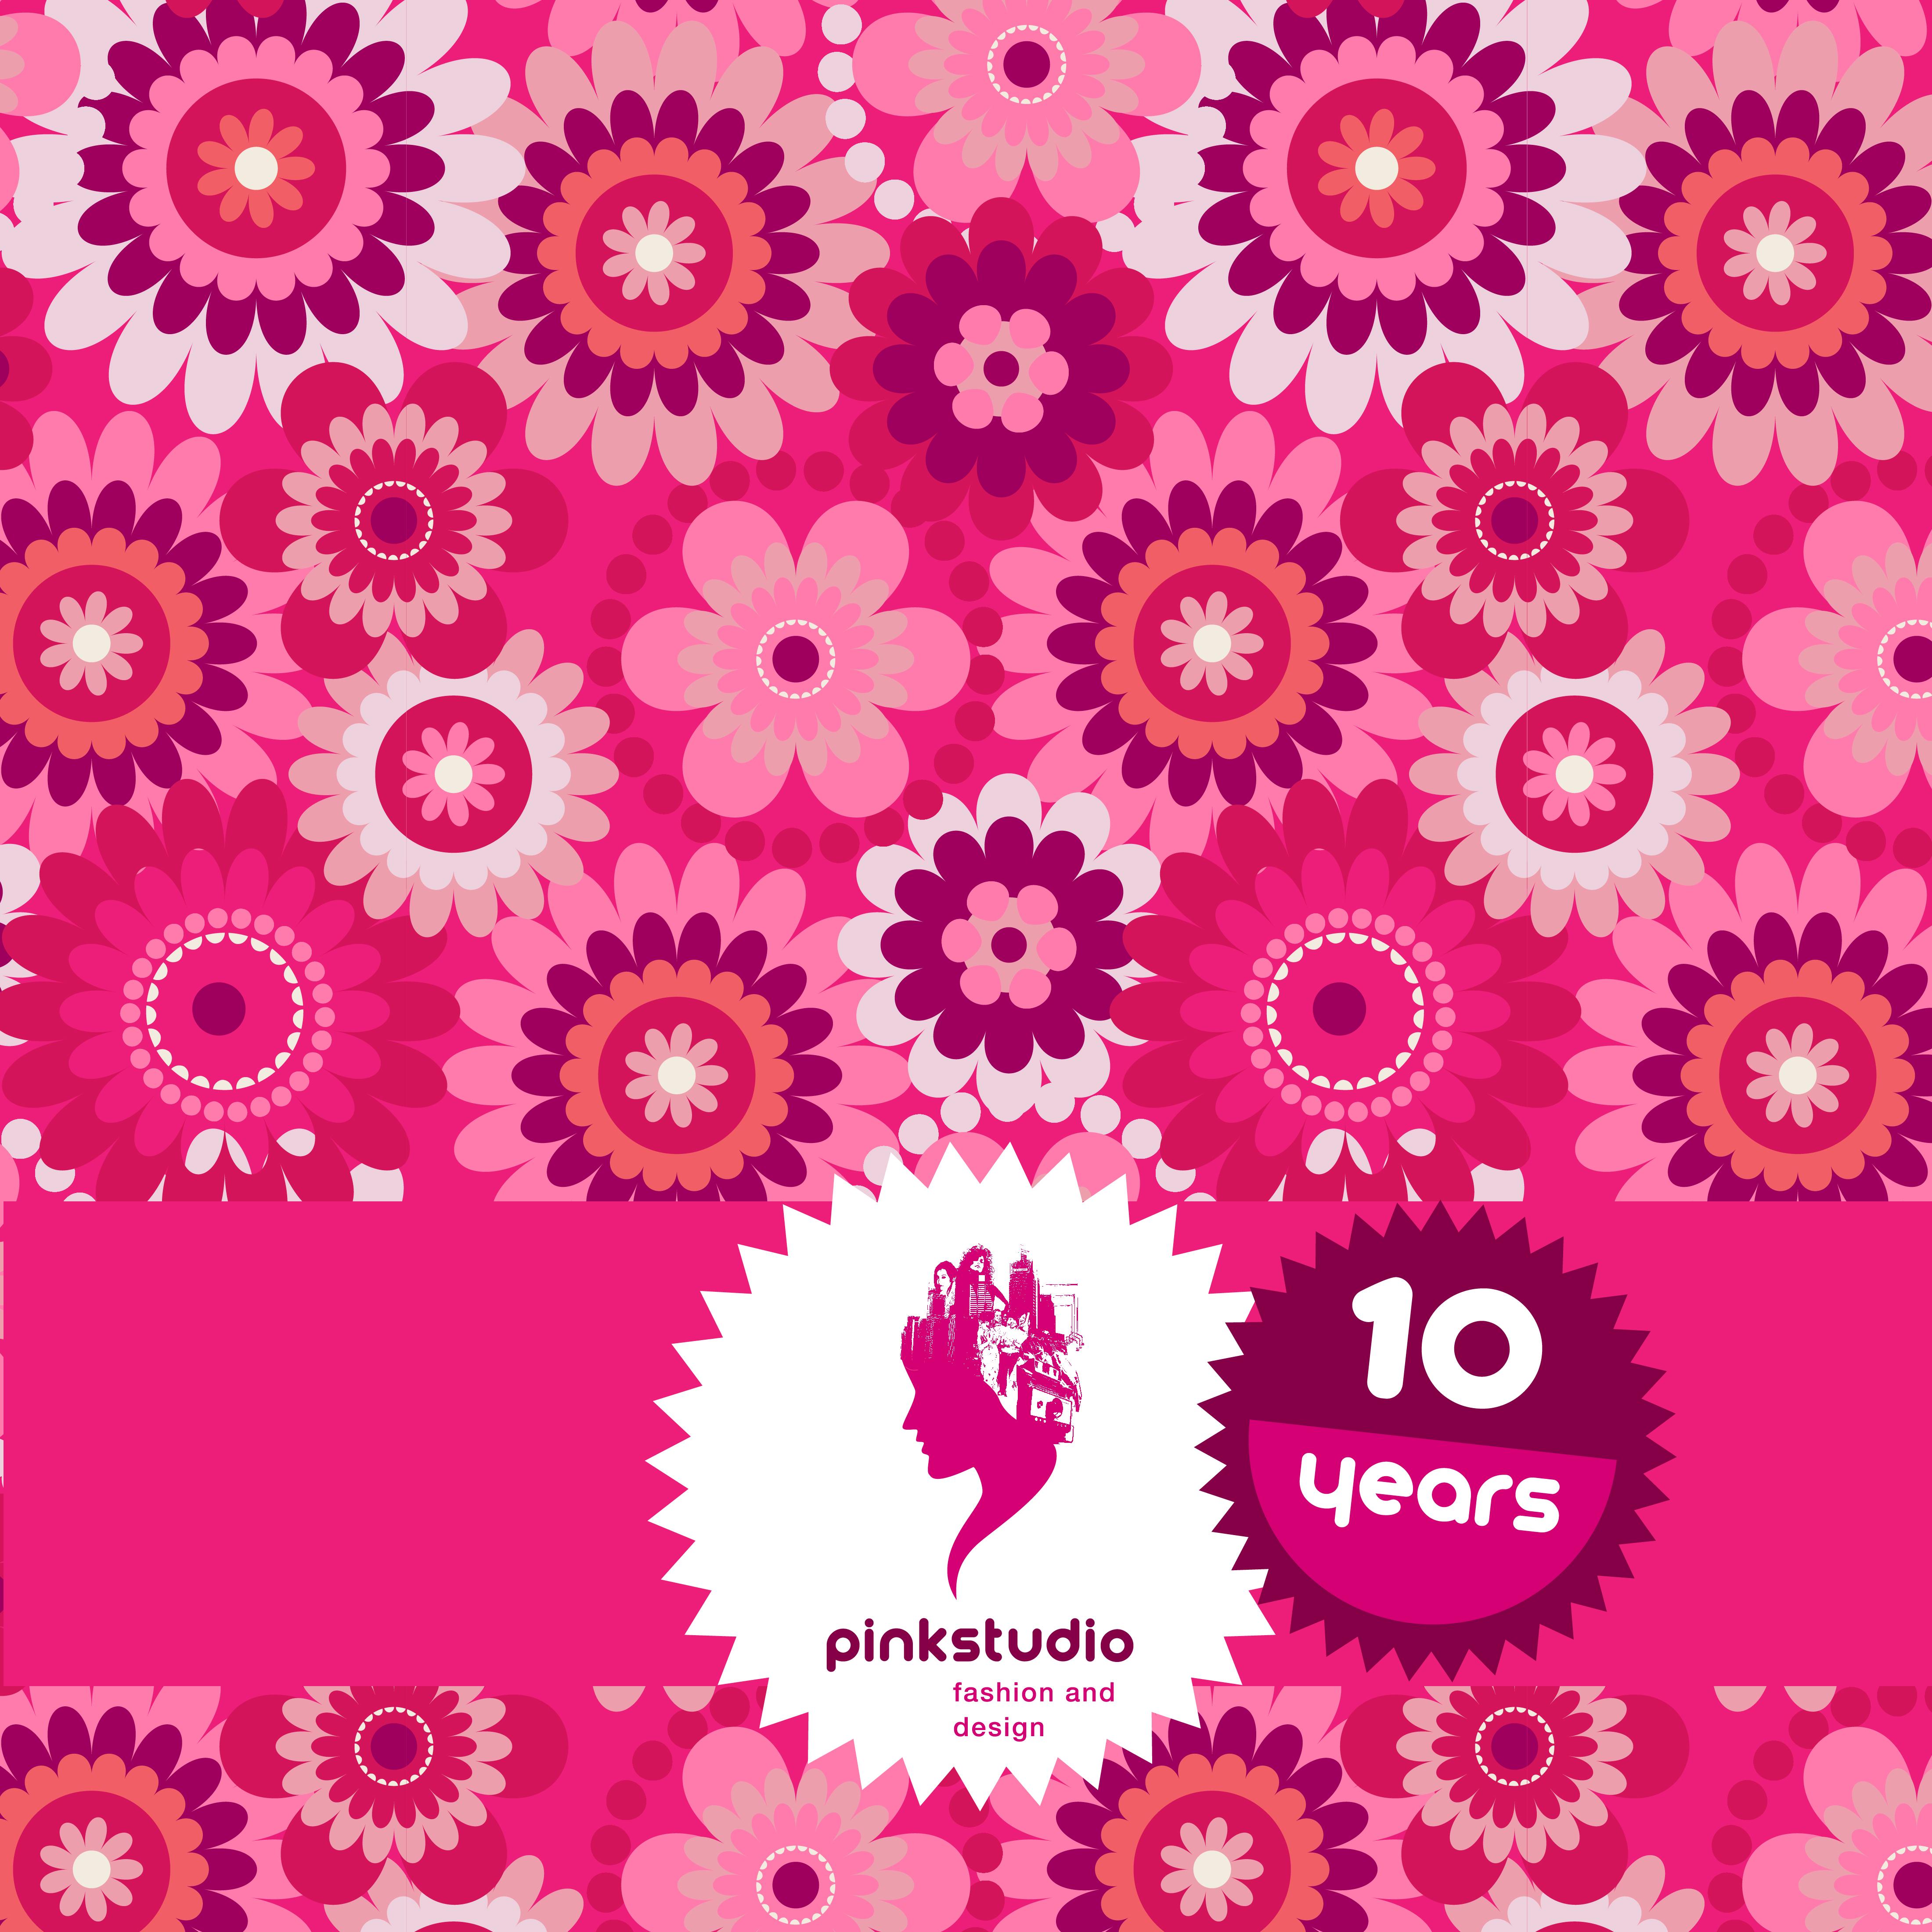 Pink Studio 10th anniversary